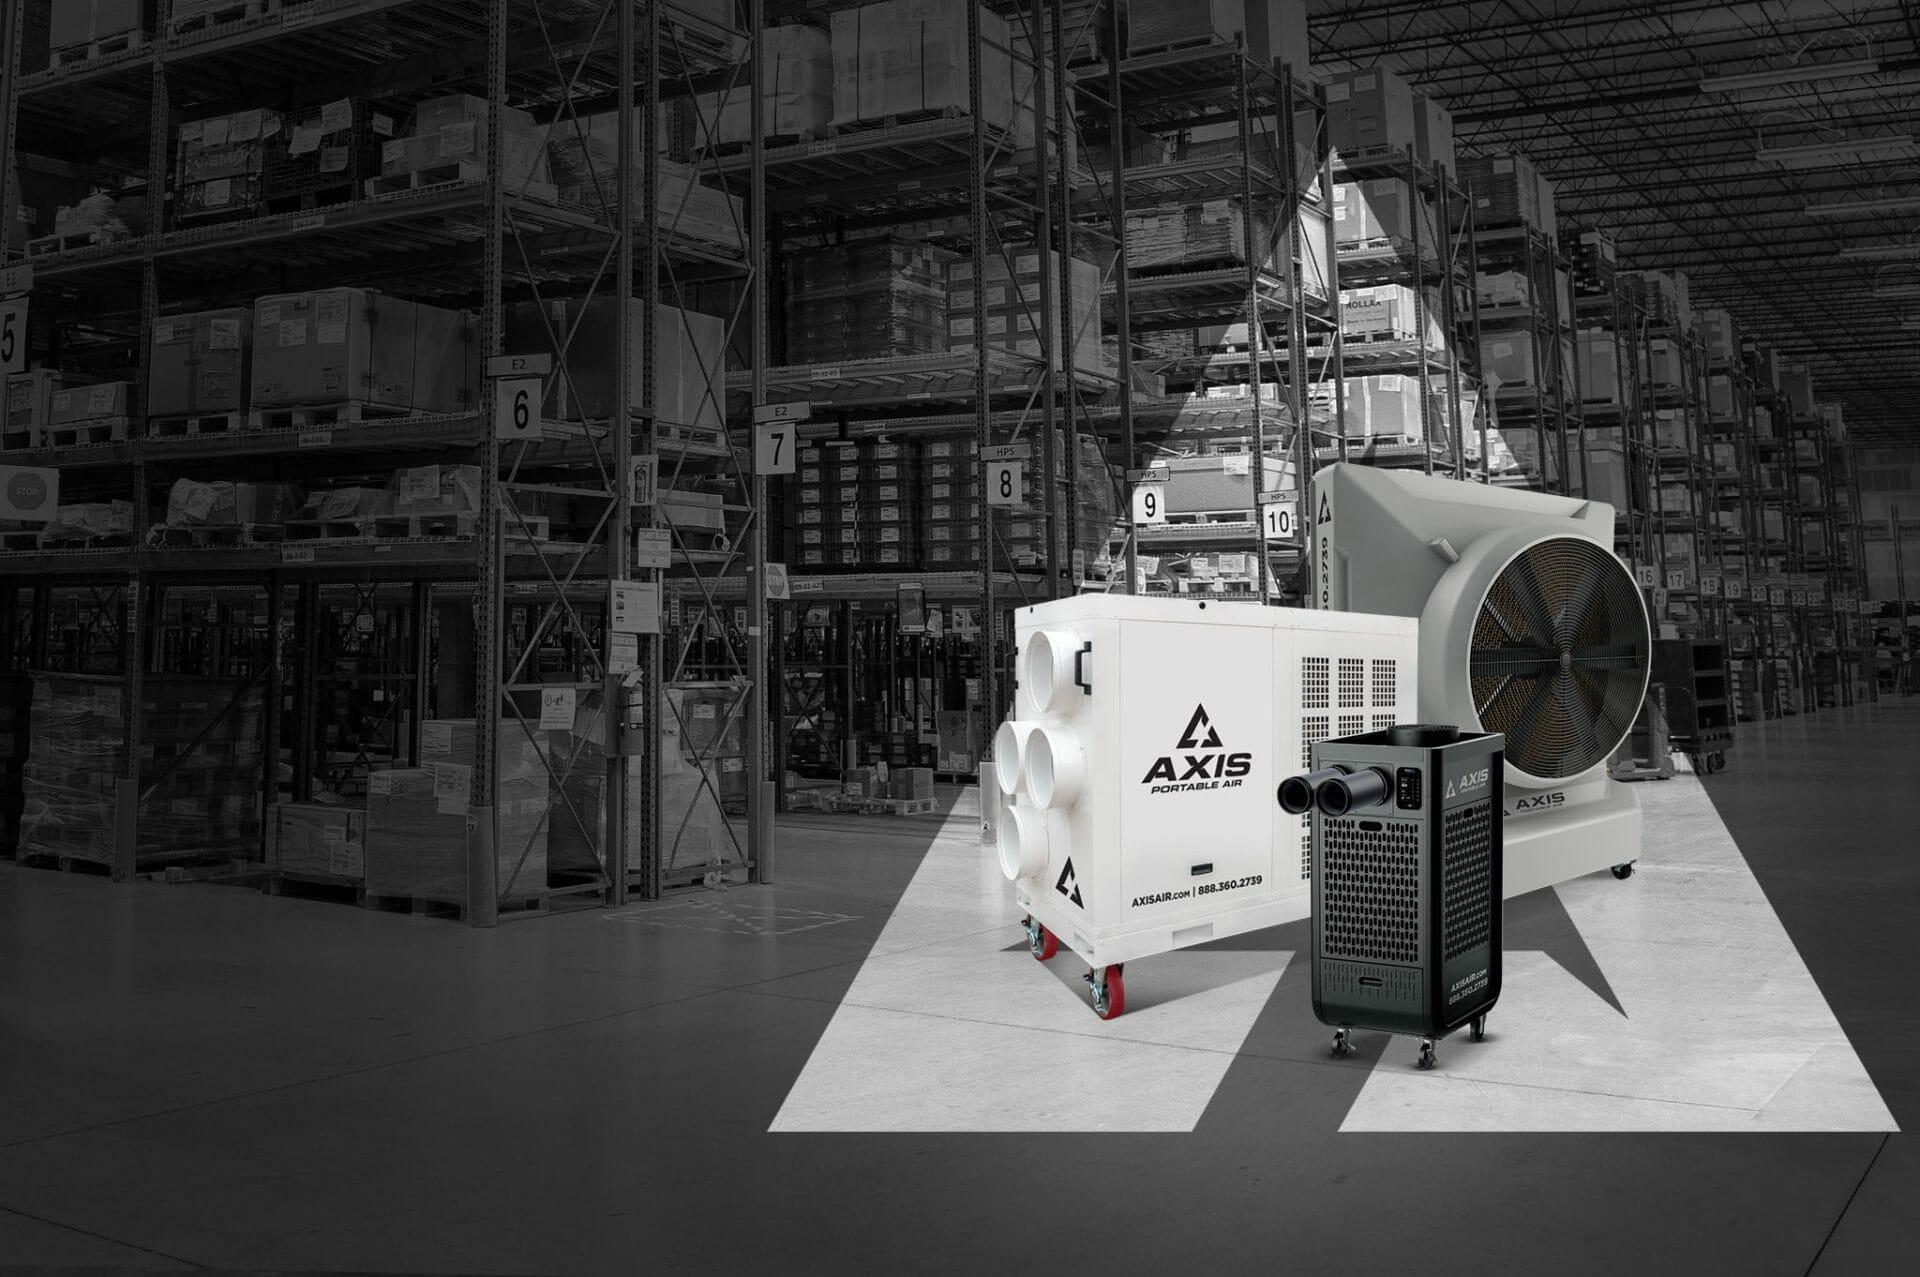 Axis Portable Air Warehouses